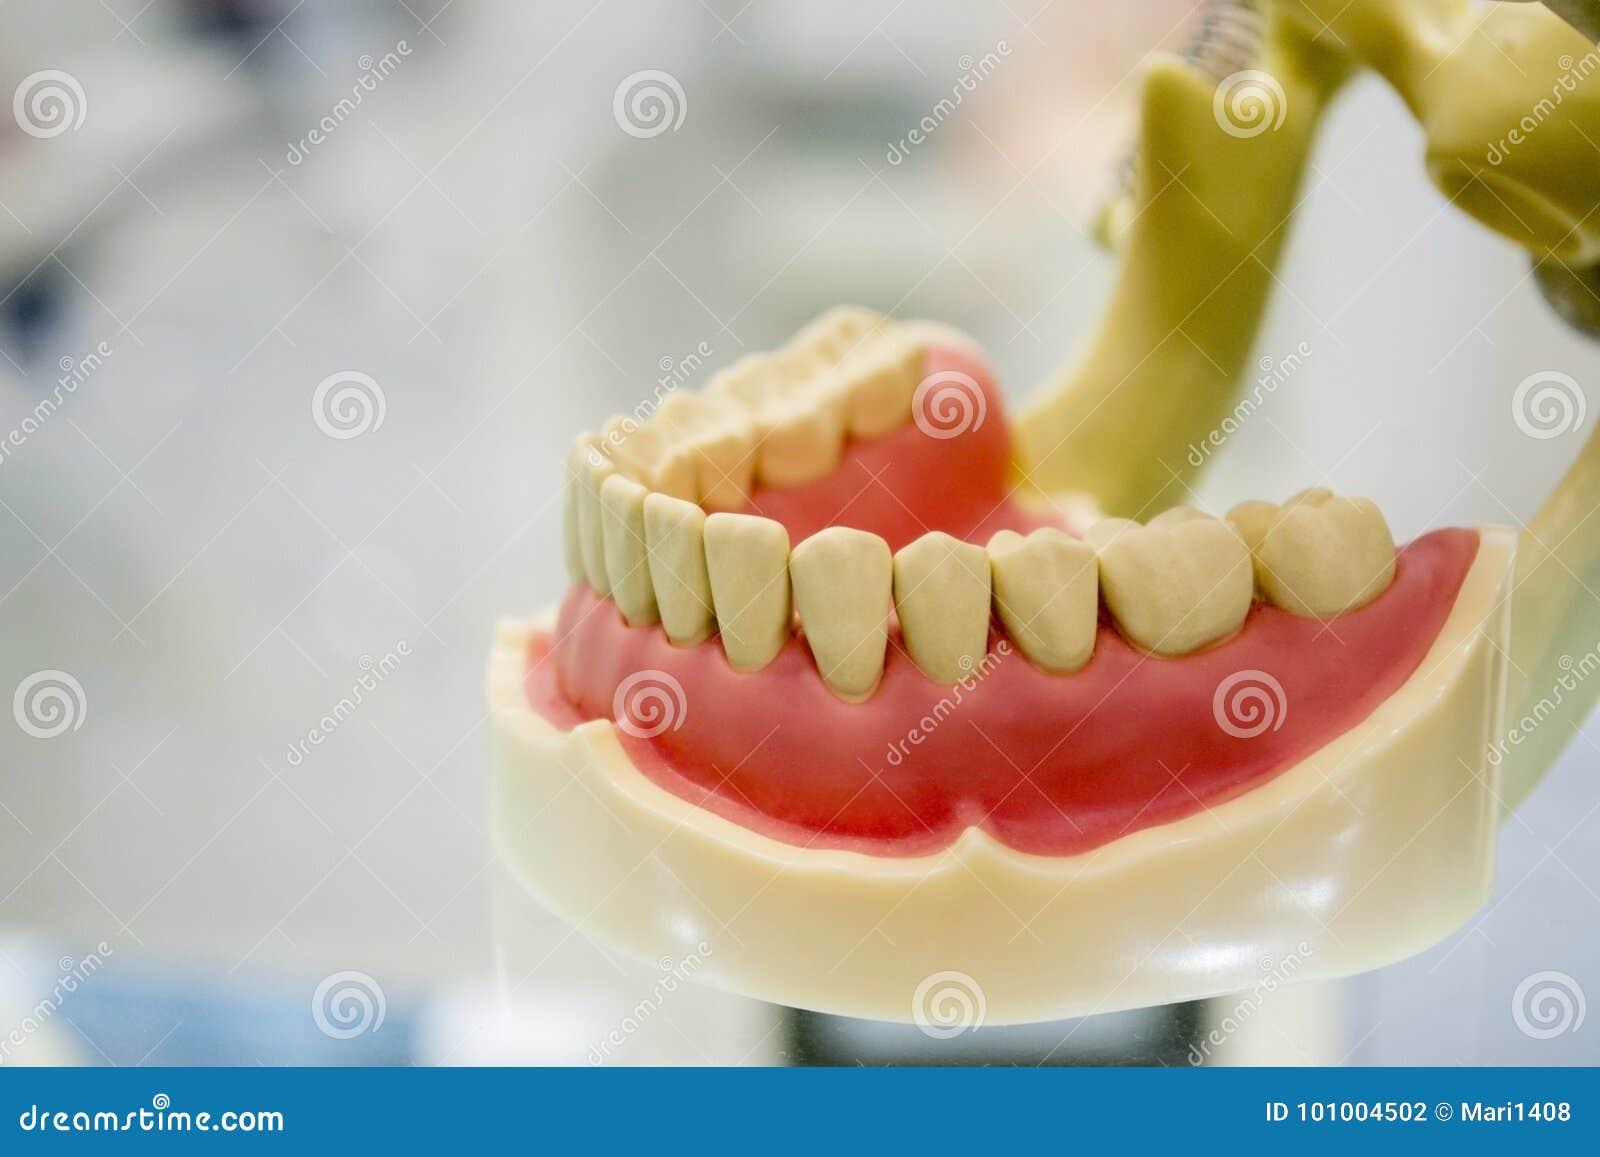 Model Of Human Teeth Of The Human Jaw Stock Photo Image Of Health